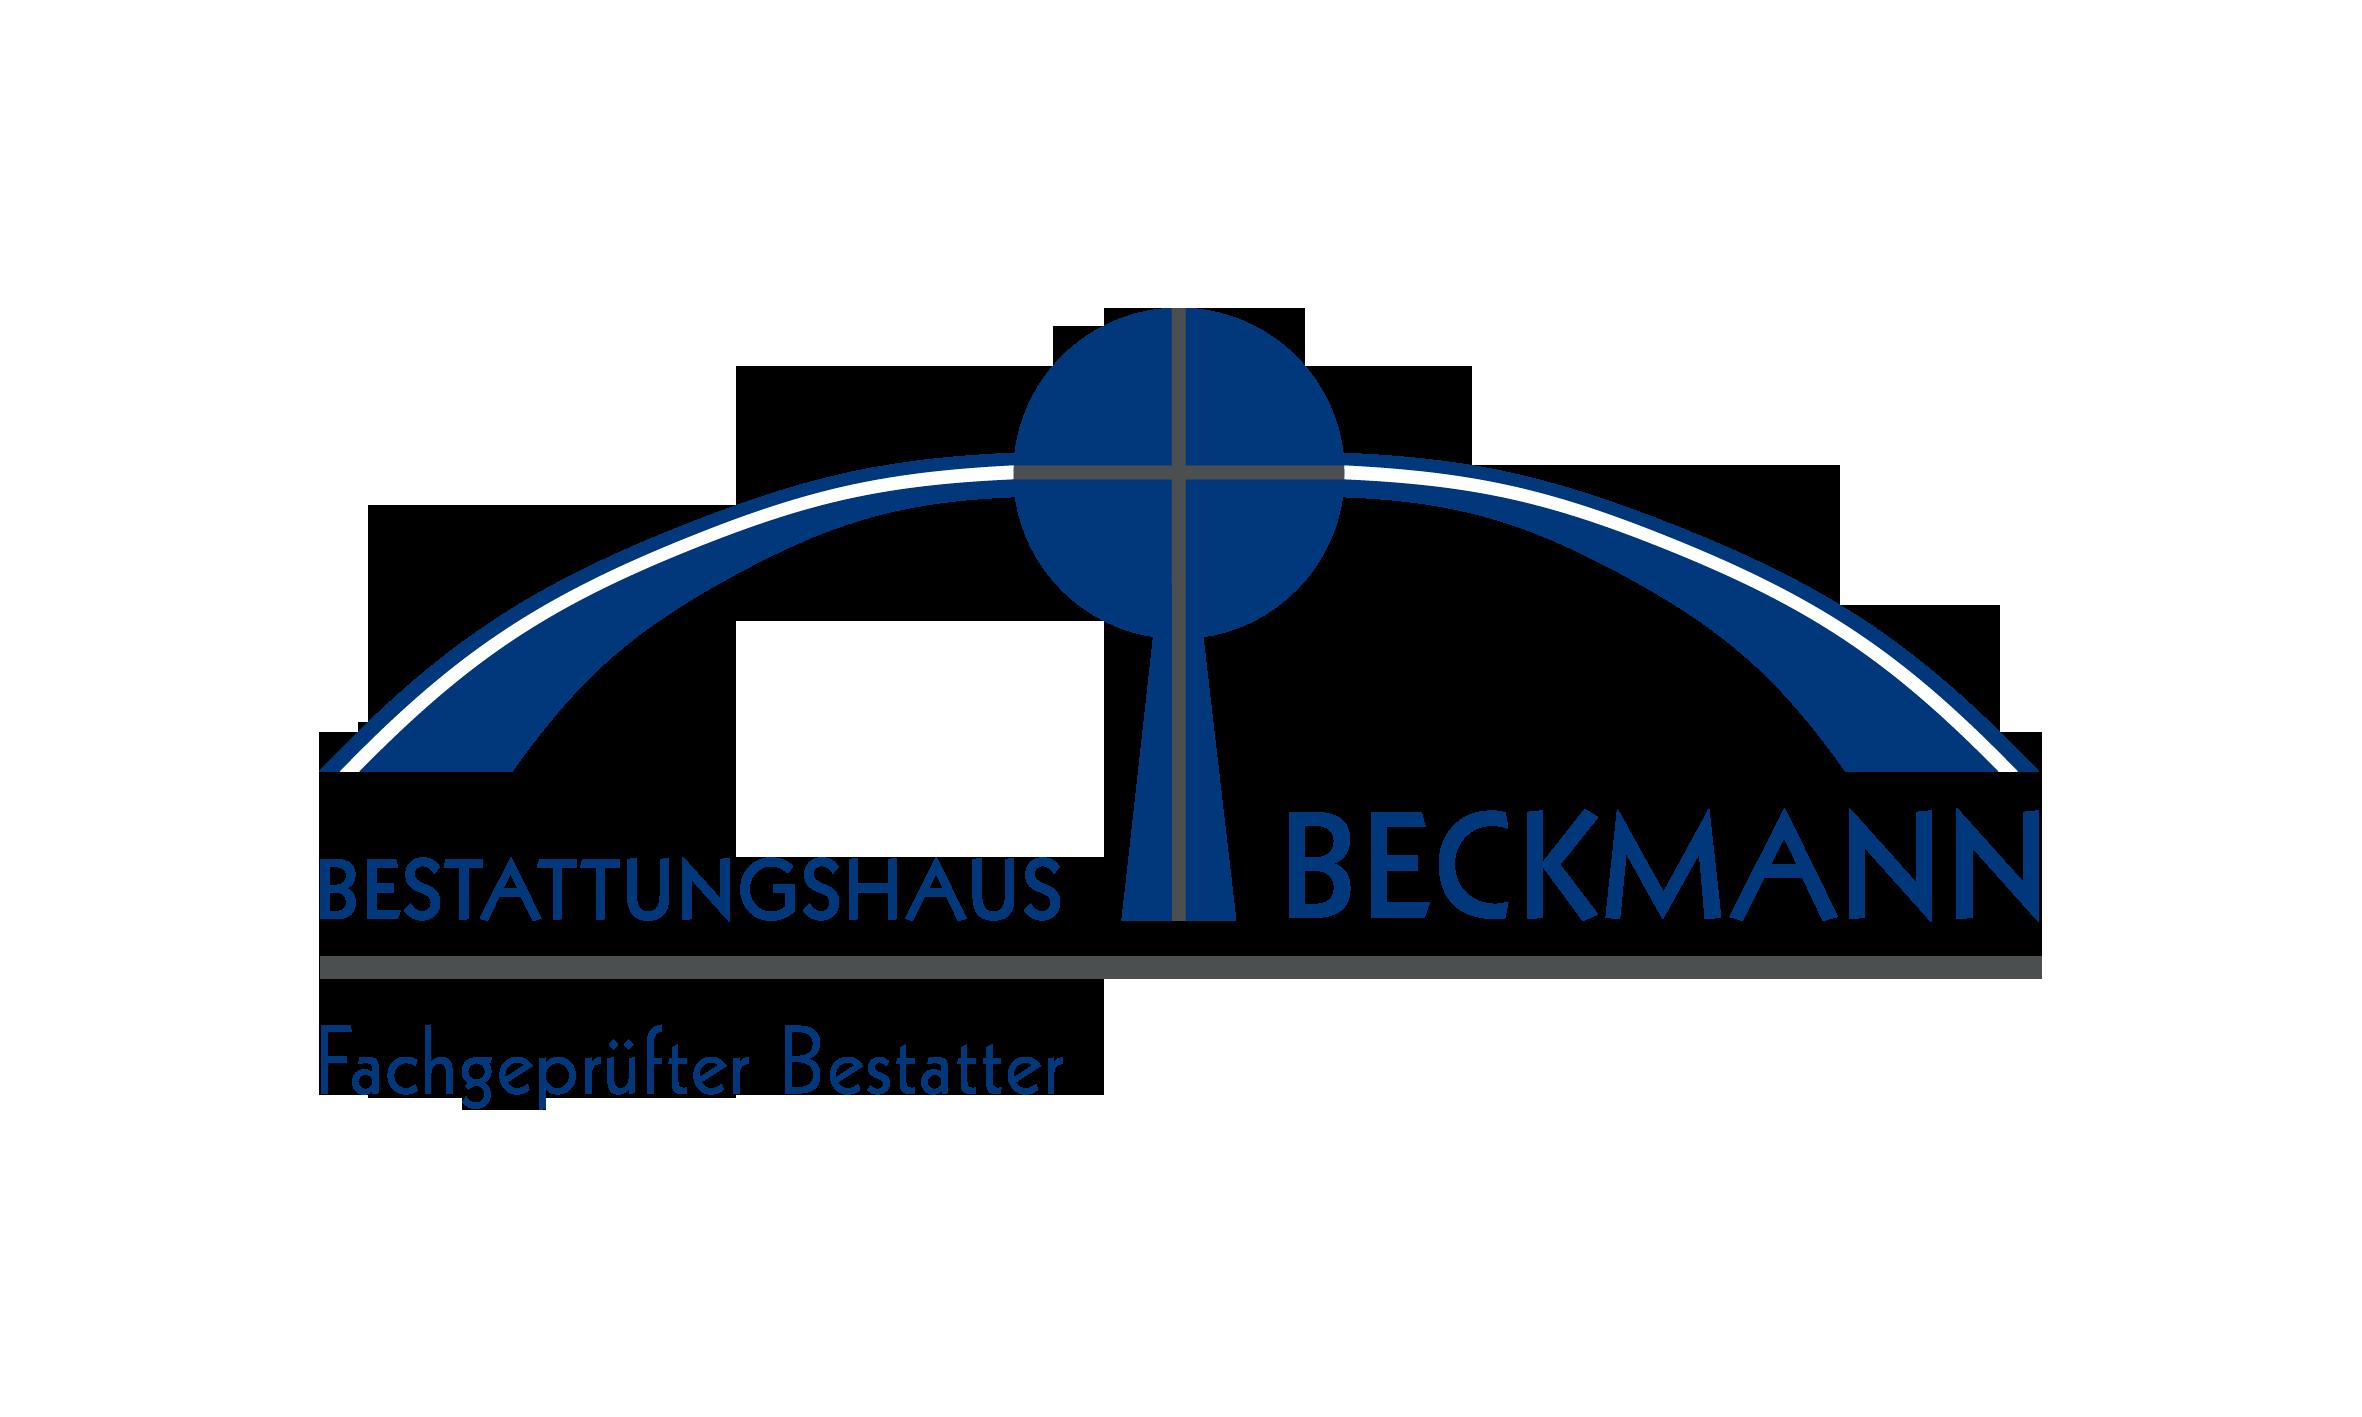 Bestattungshaus Beckmann